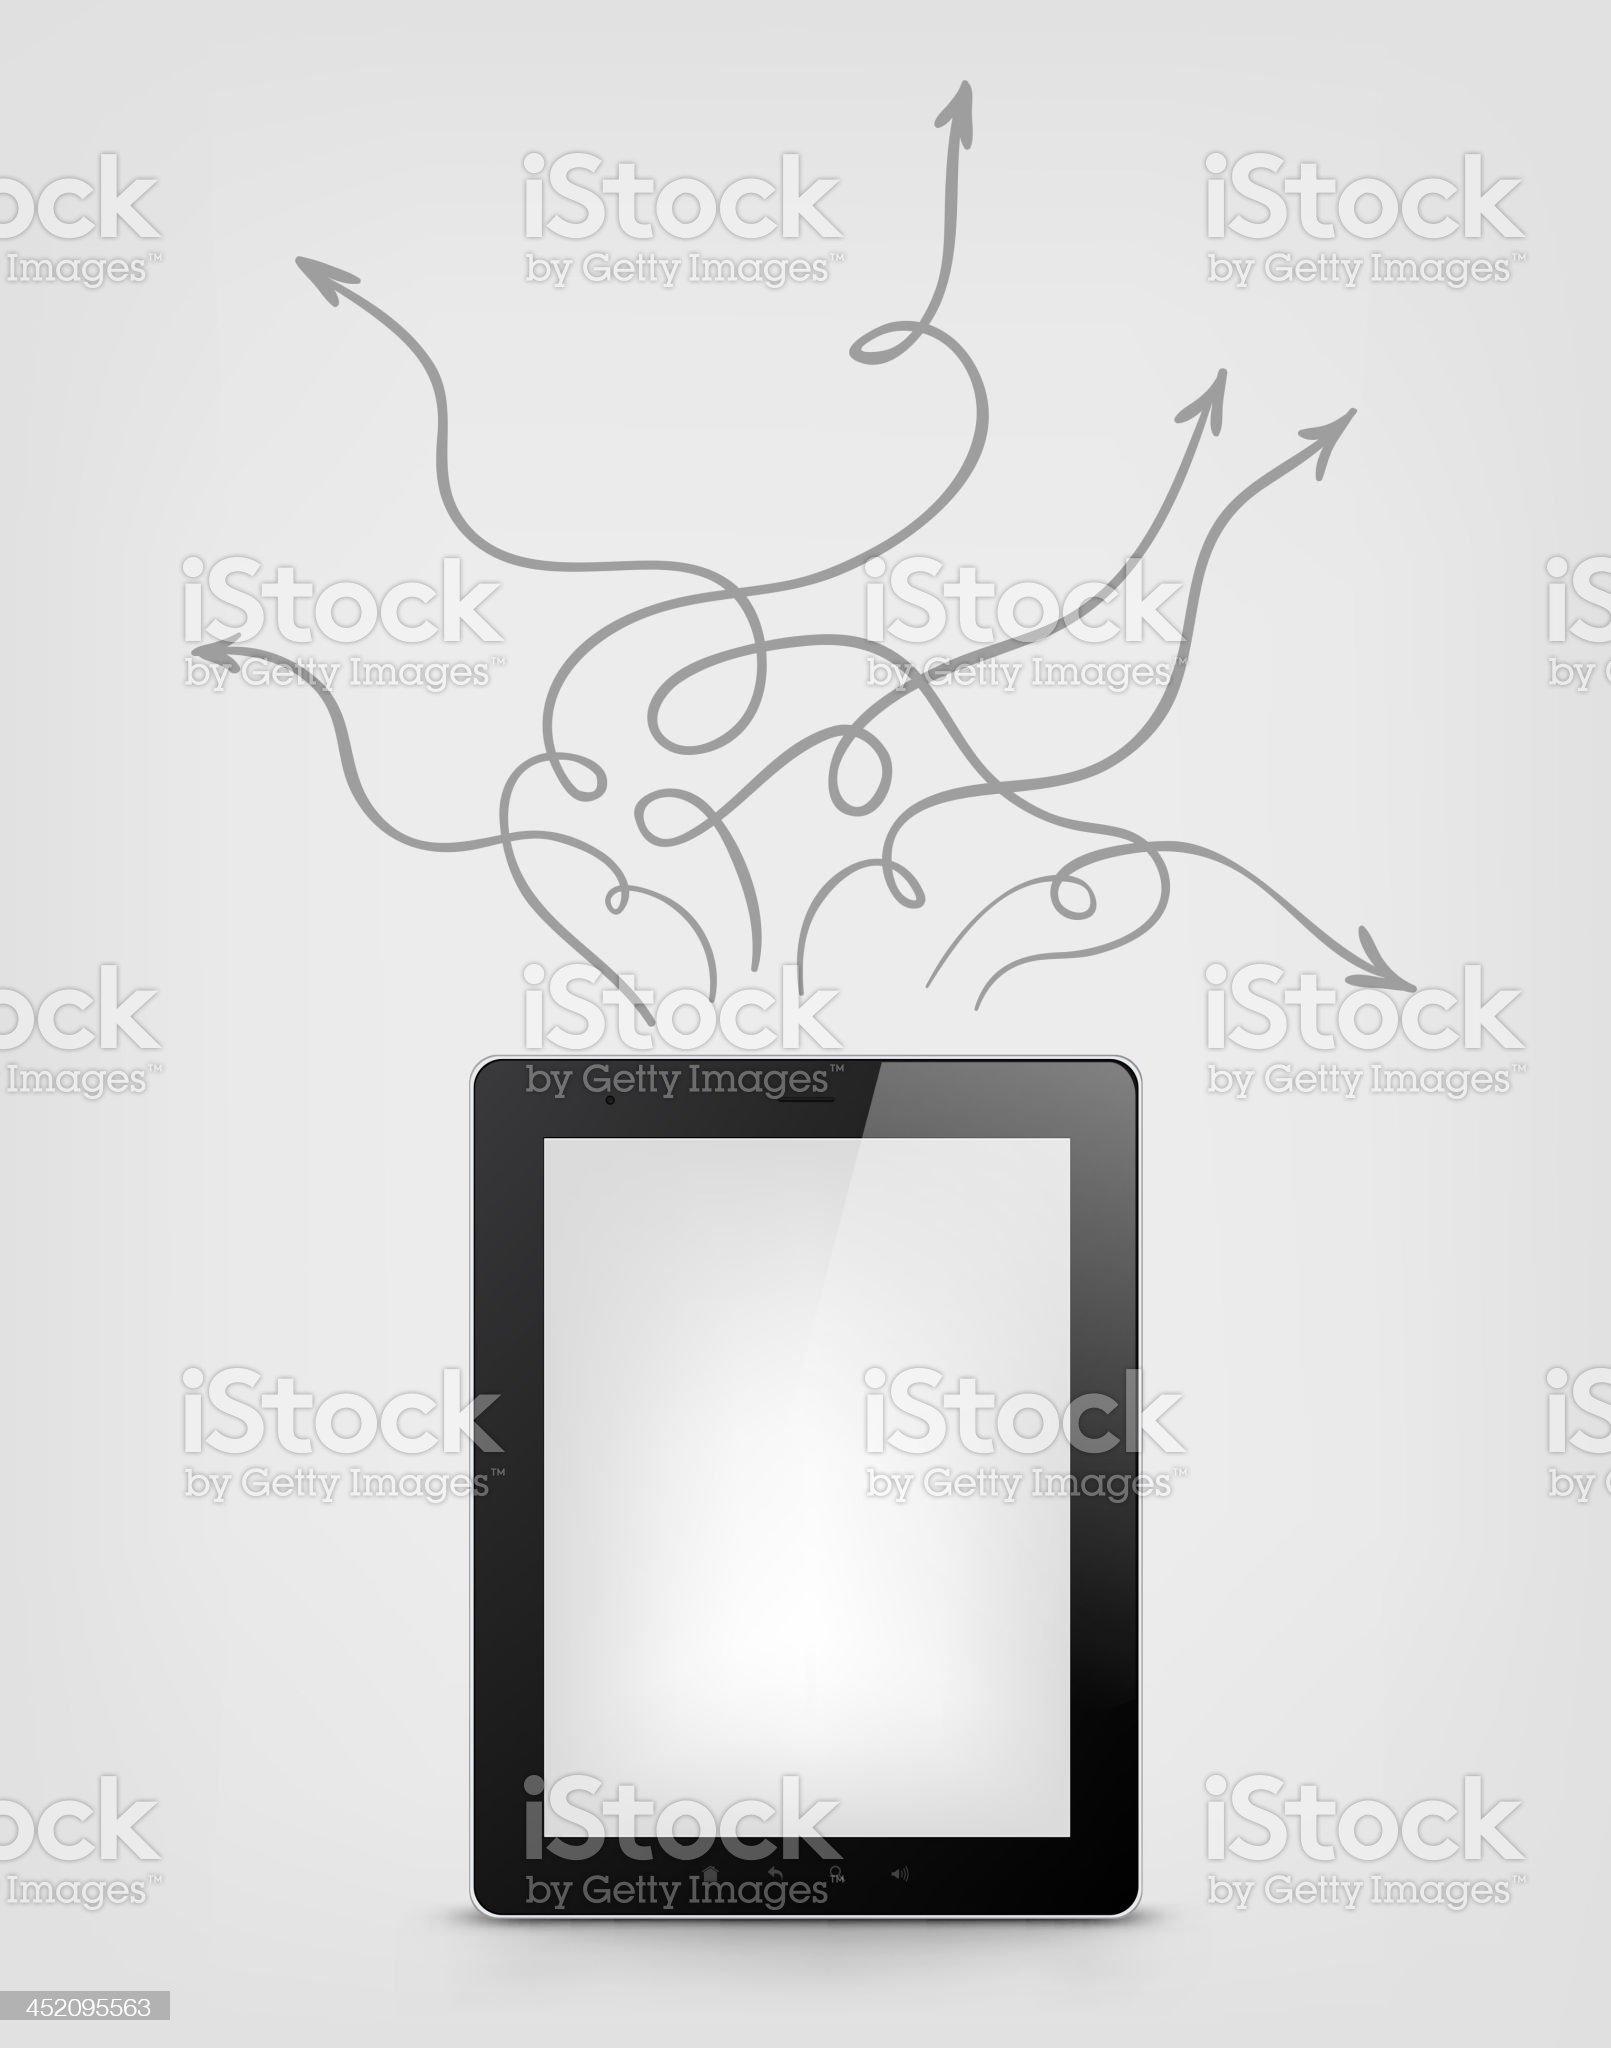 Digital Tablet Concept royalty-free stock vector art